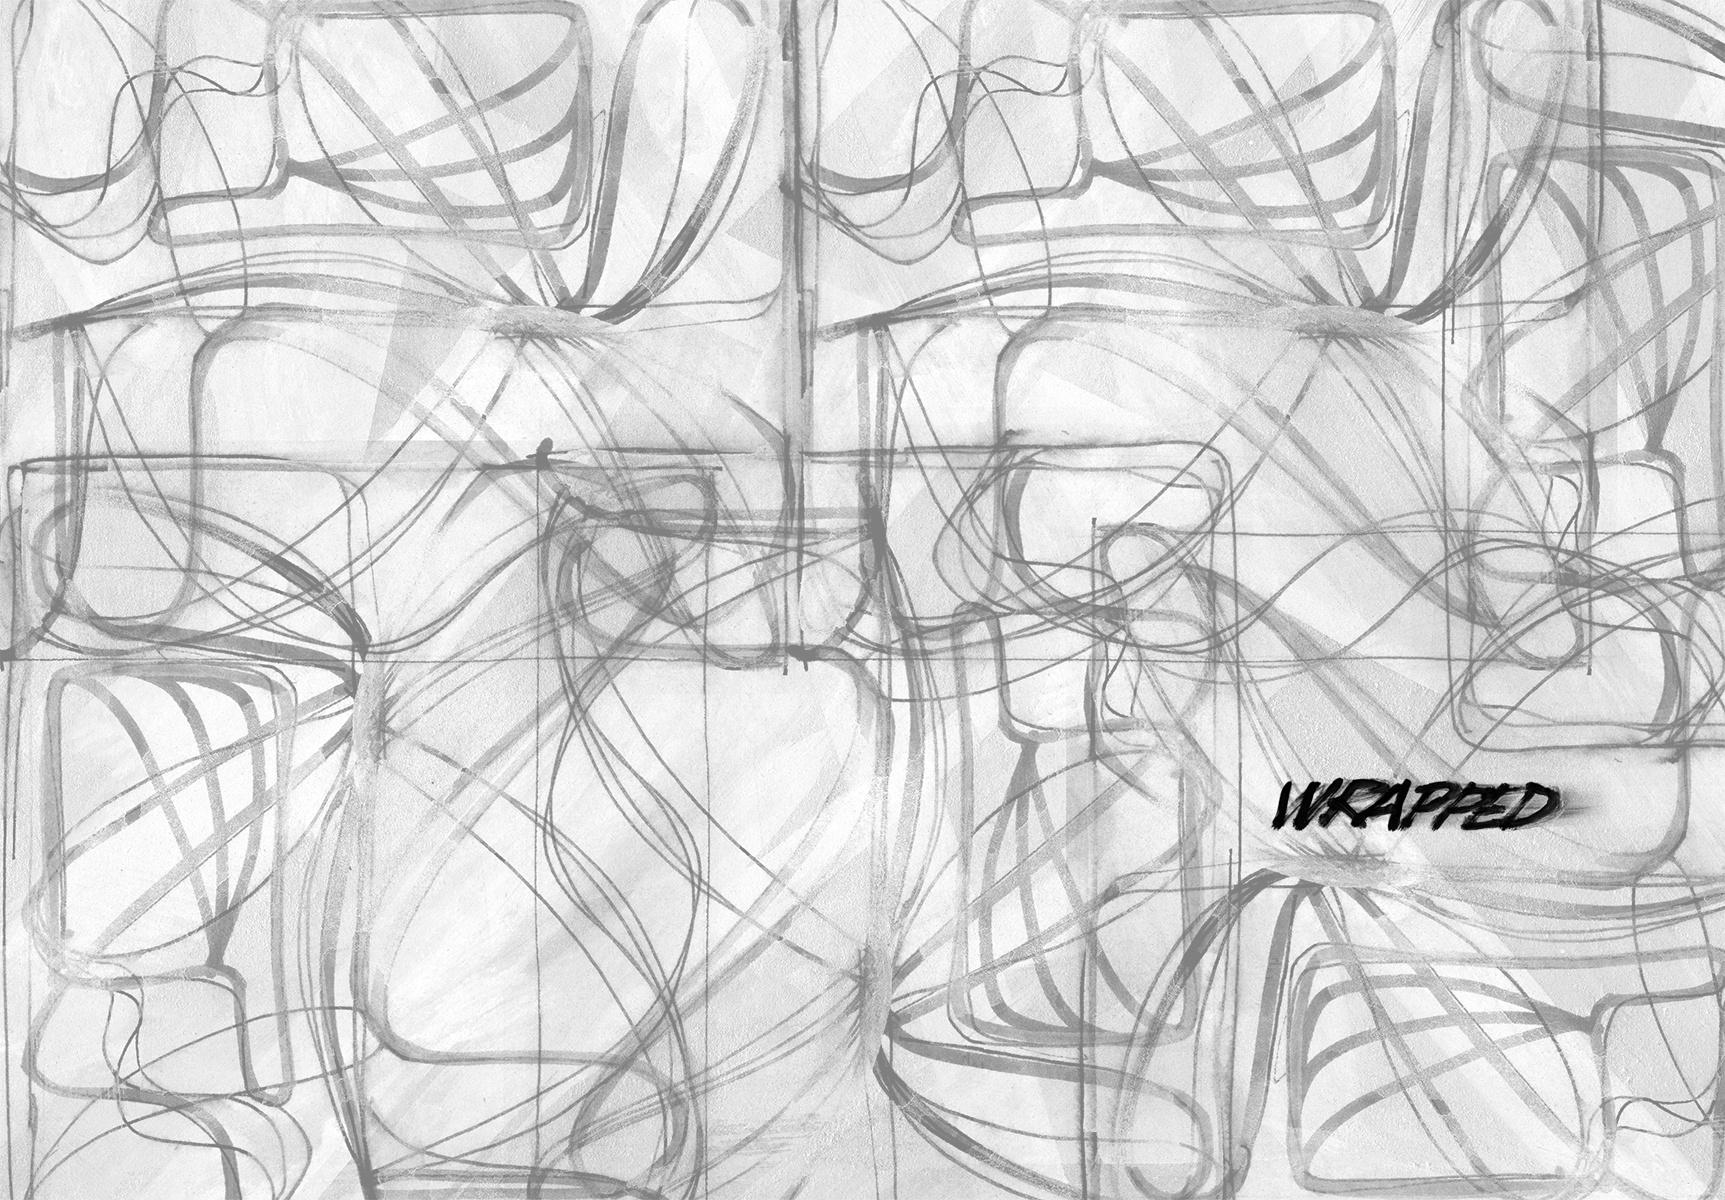 2016_header5_wrapped.jpg